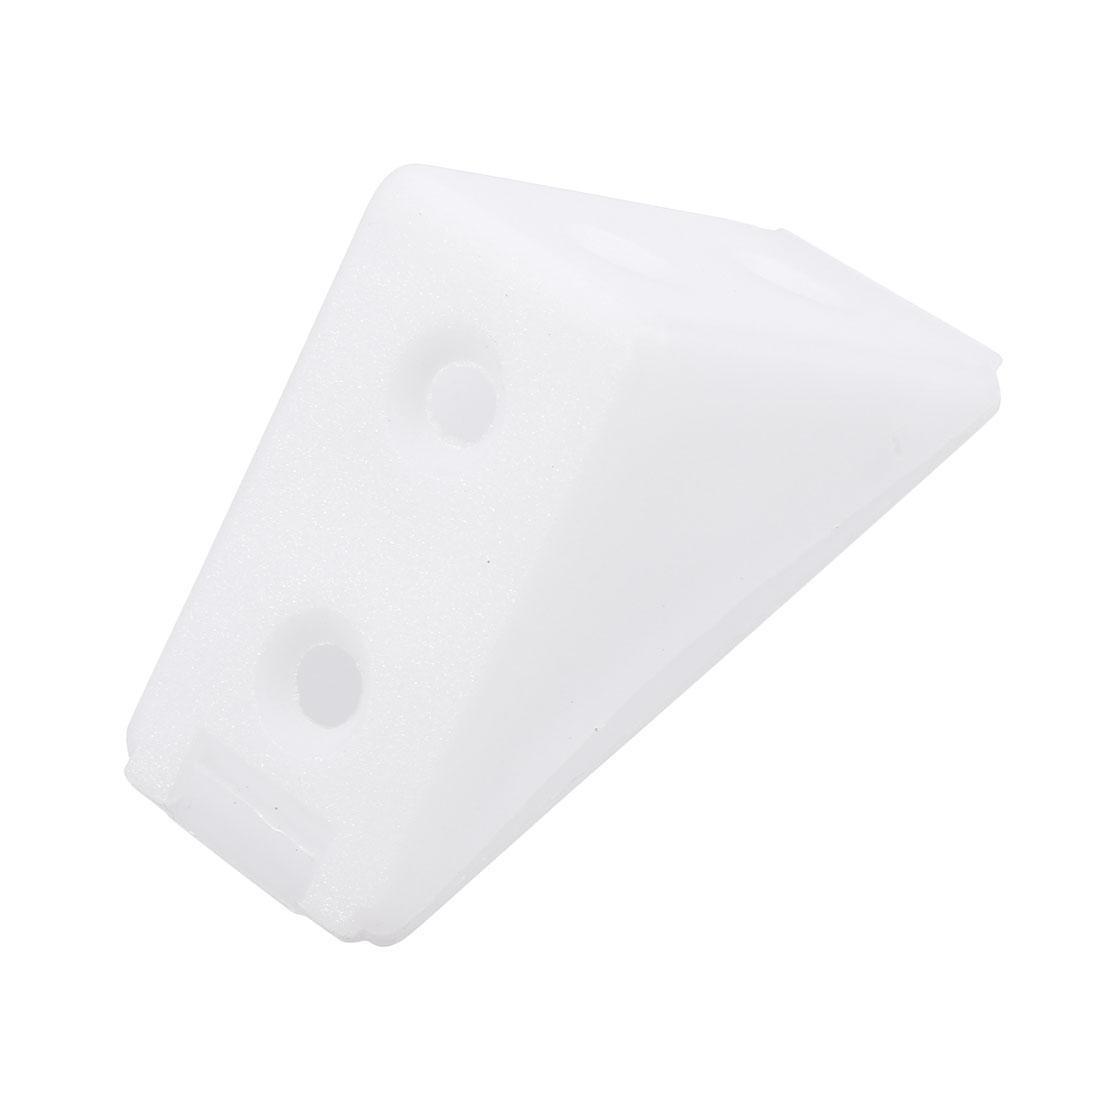 Shelf Cabinet Plastic Corner Braces 4 Holes Angle Brackets w Cover Cap, 10 Pcs